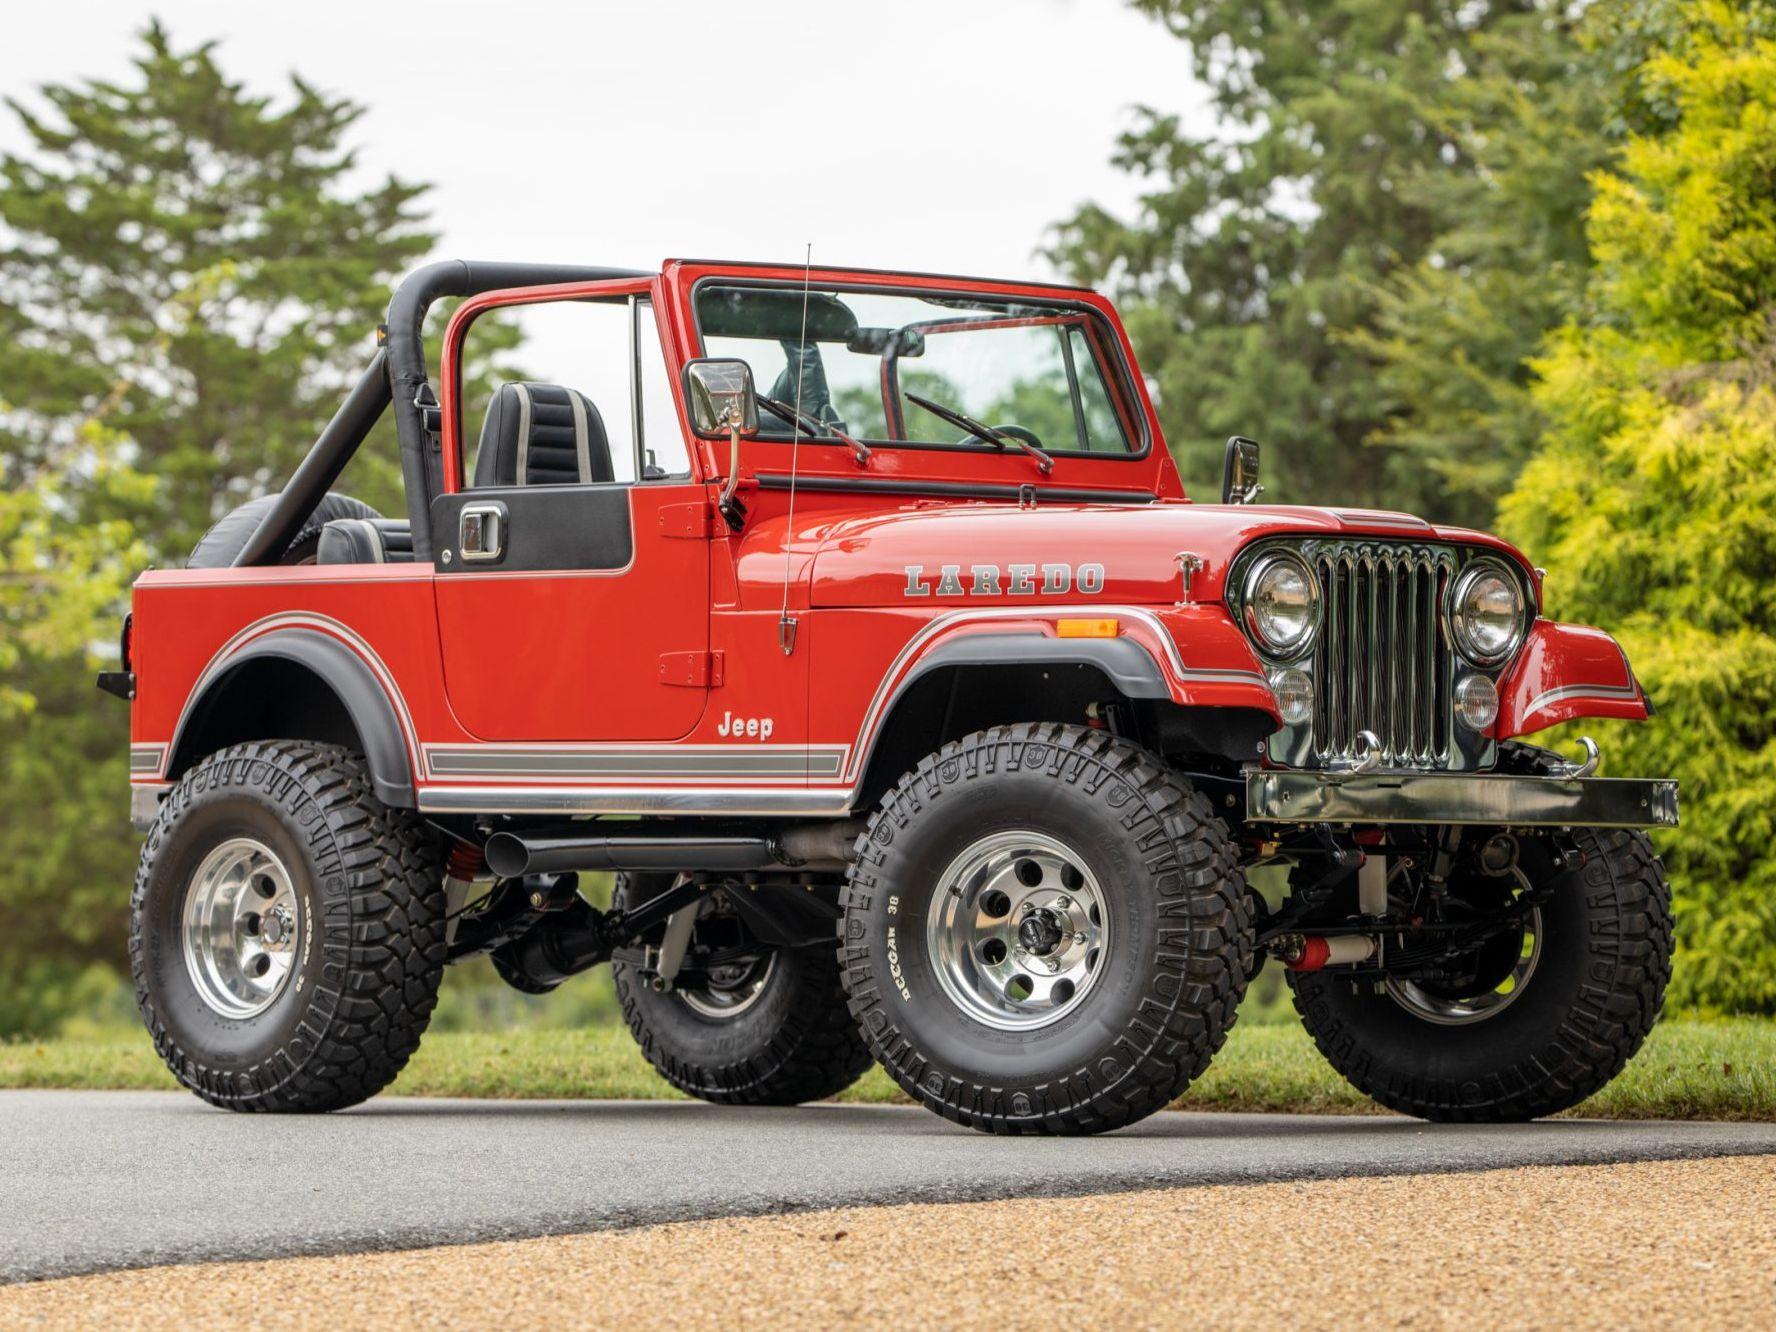 1983 Jeep CJ-7 Laredo 5-Speed